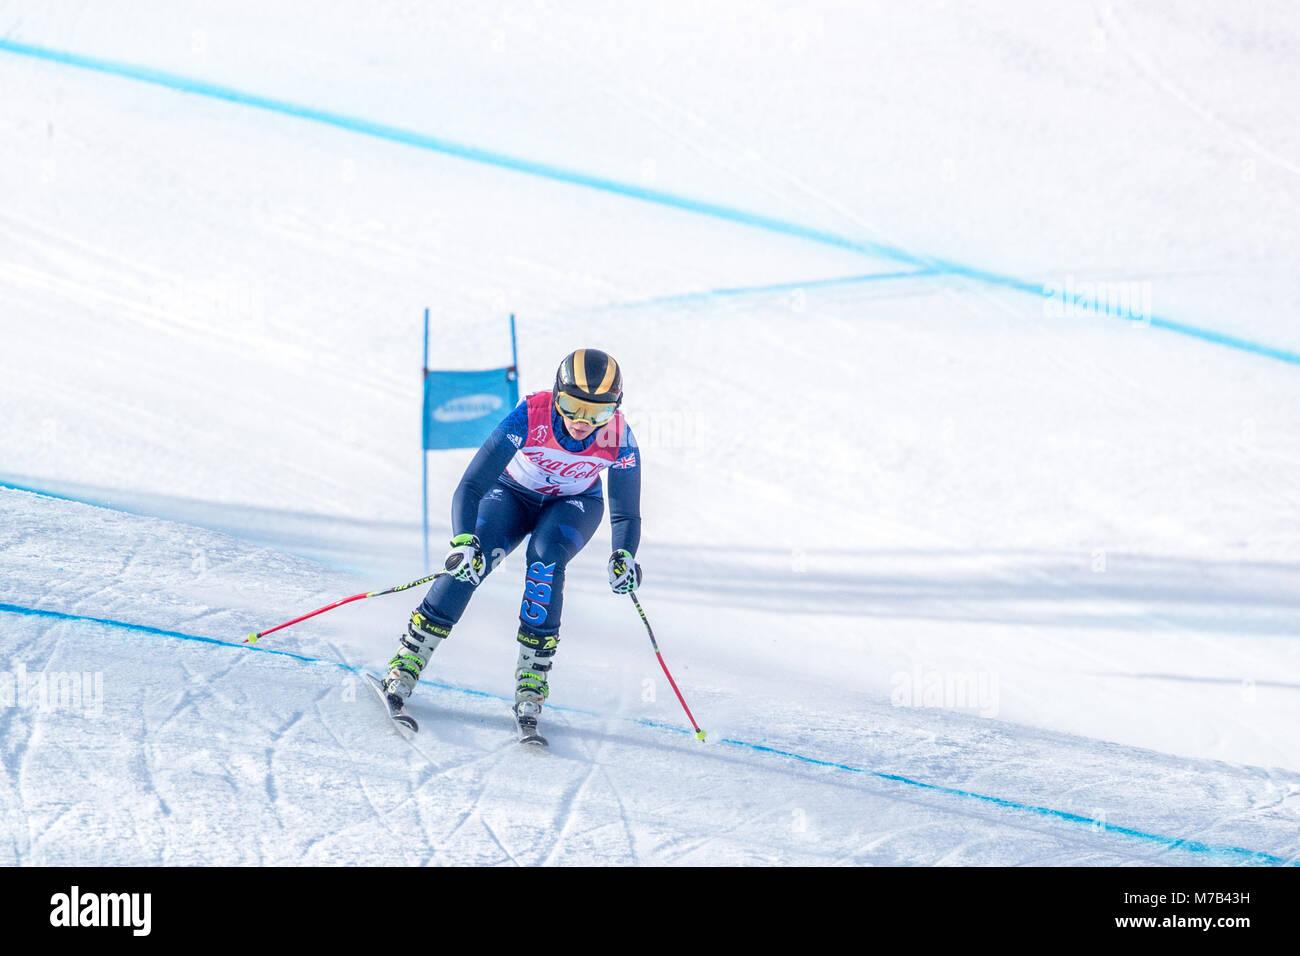 Pyeongchang, South Korea. 10th Mar, 2018. March 10th Pyeongchang Korea. During women's downhill, visually impaired Stock Photo